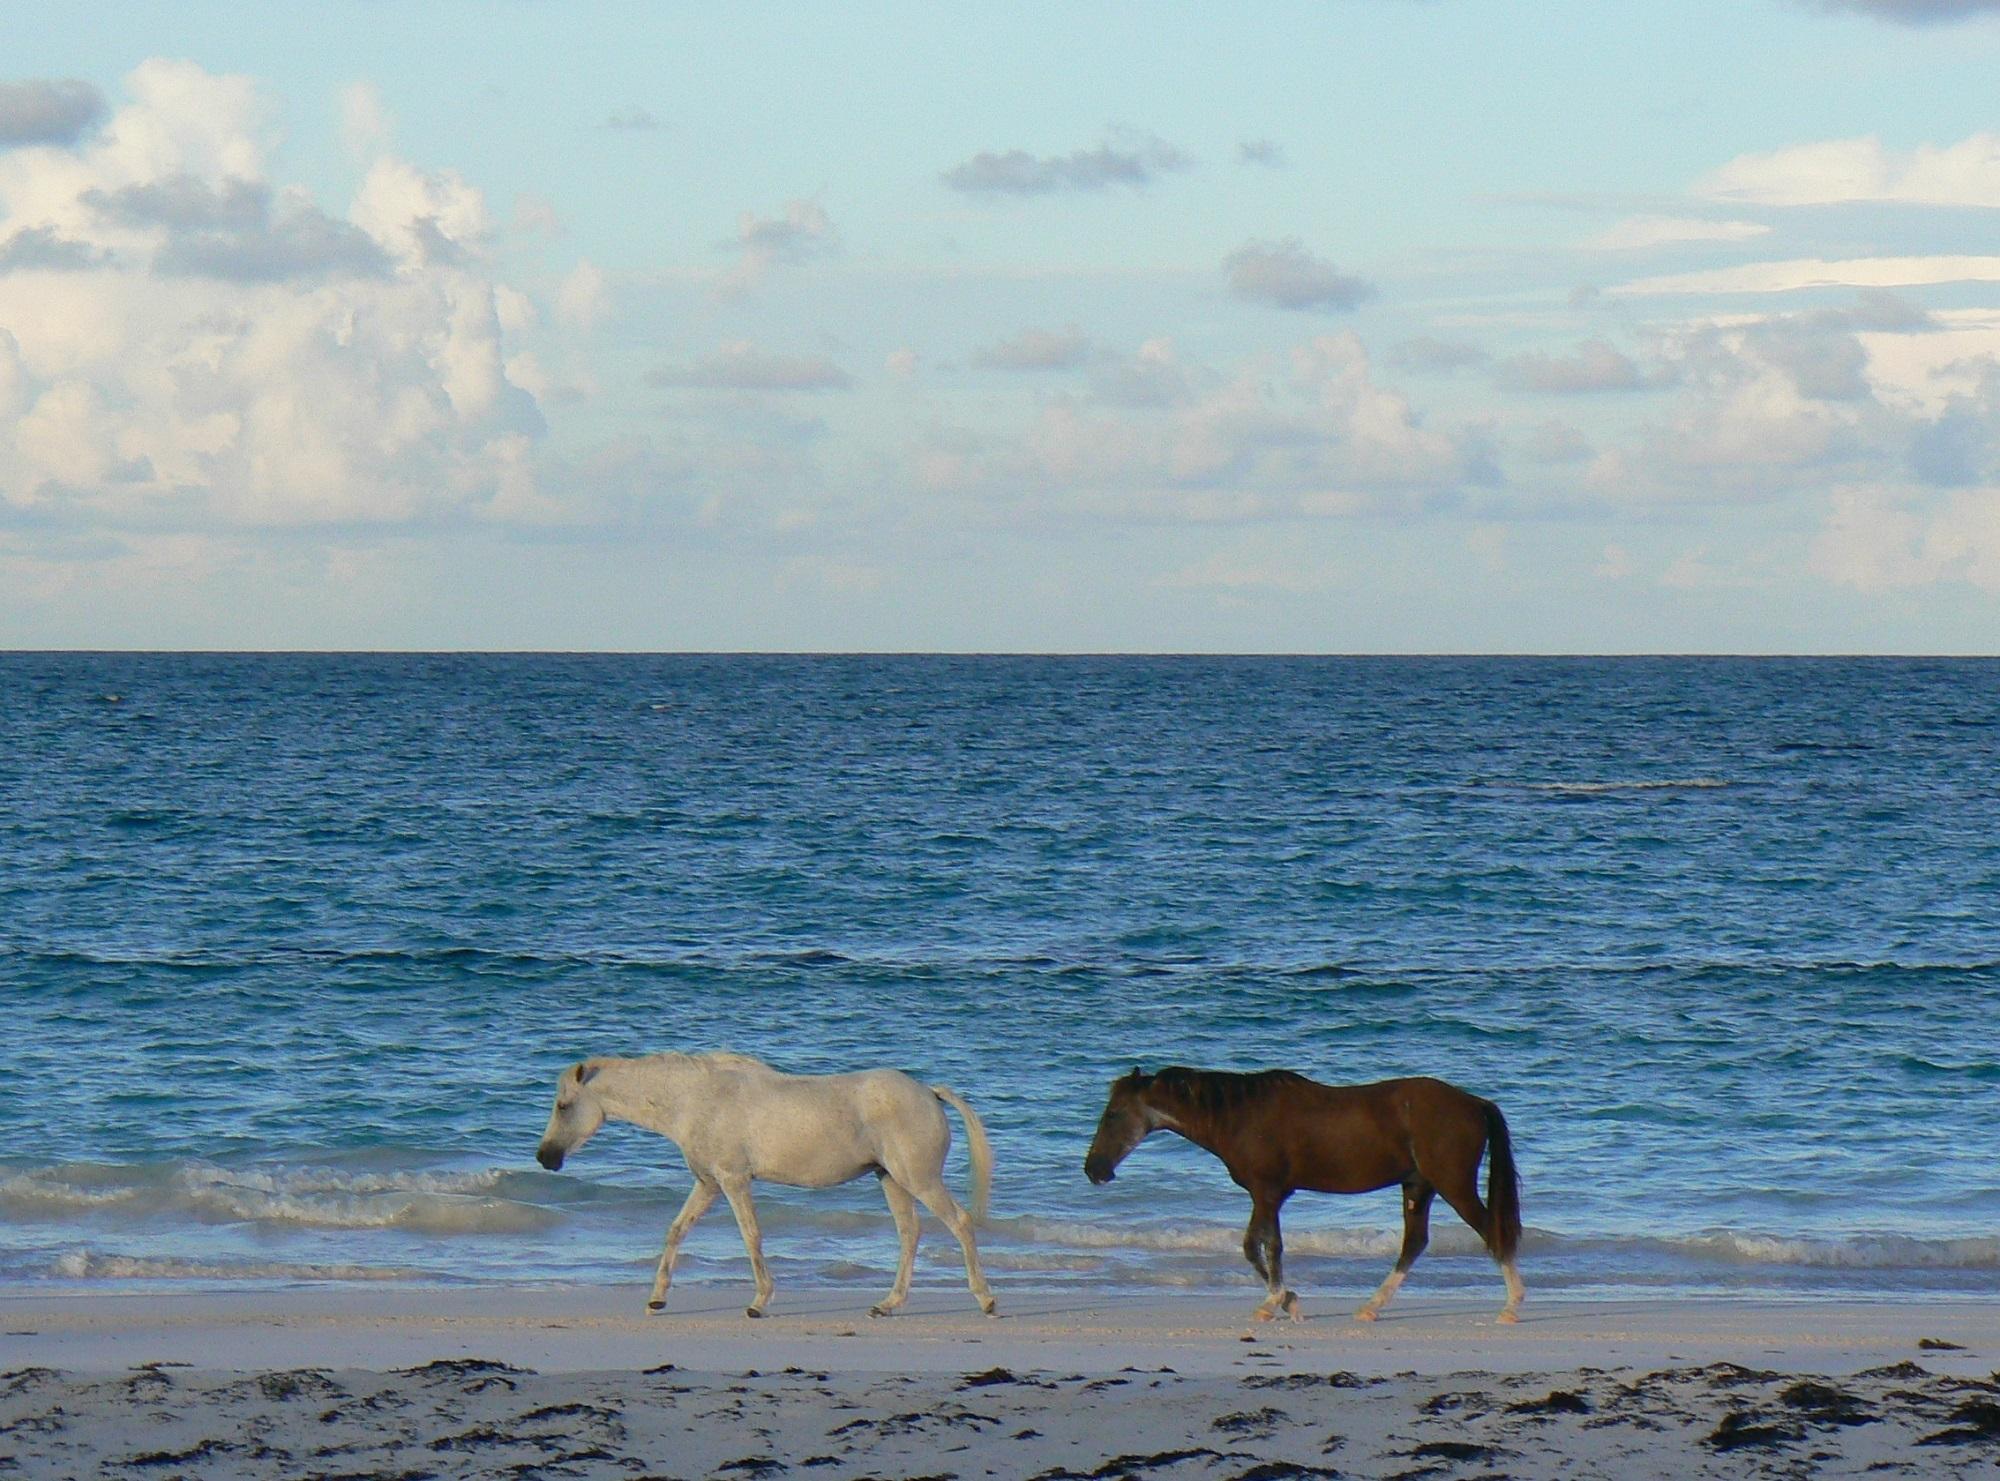 Wild horses on the shore photo